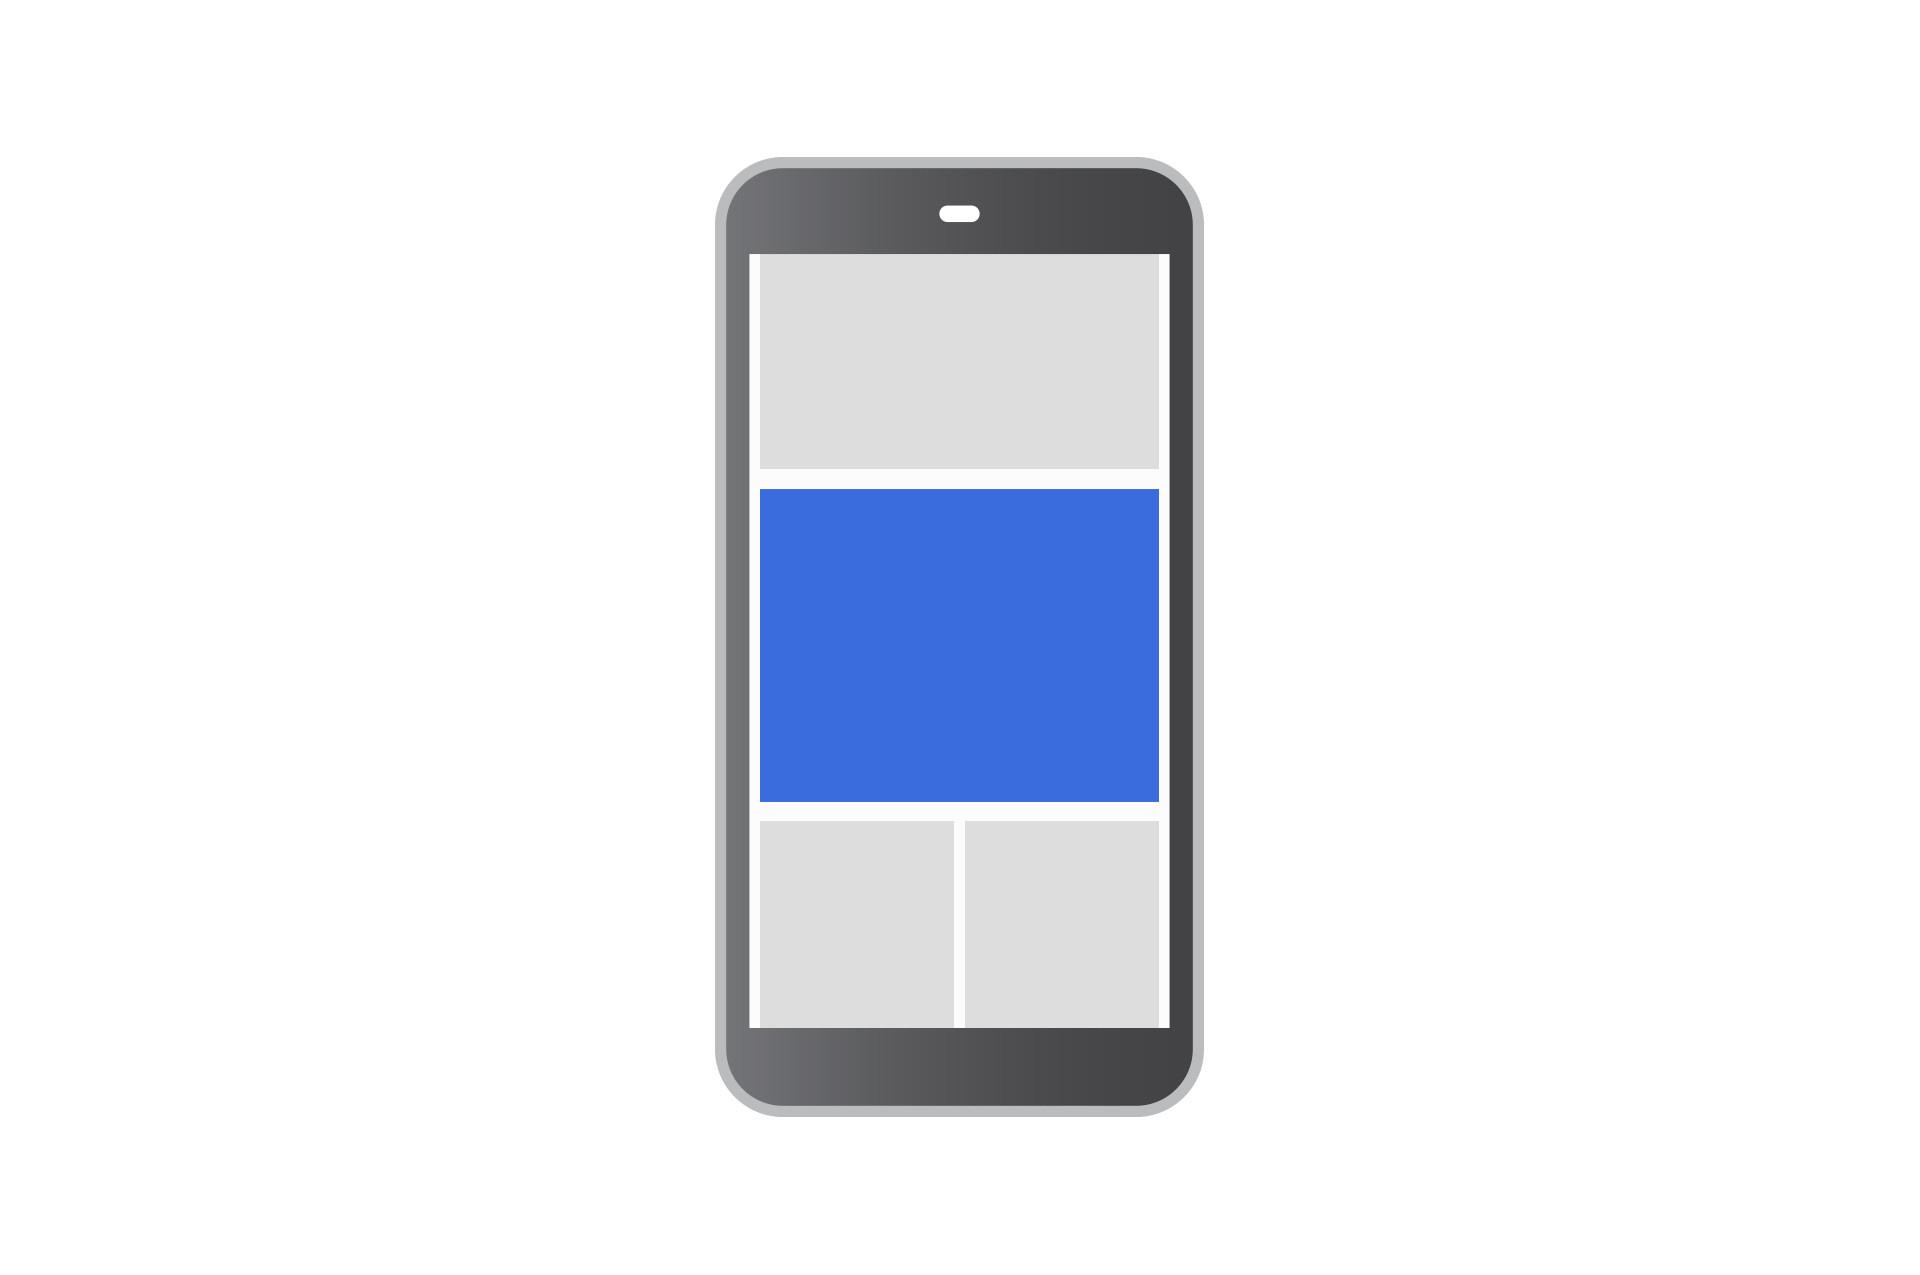 Mobil - Native Ads